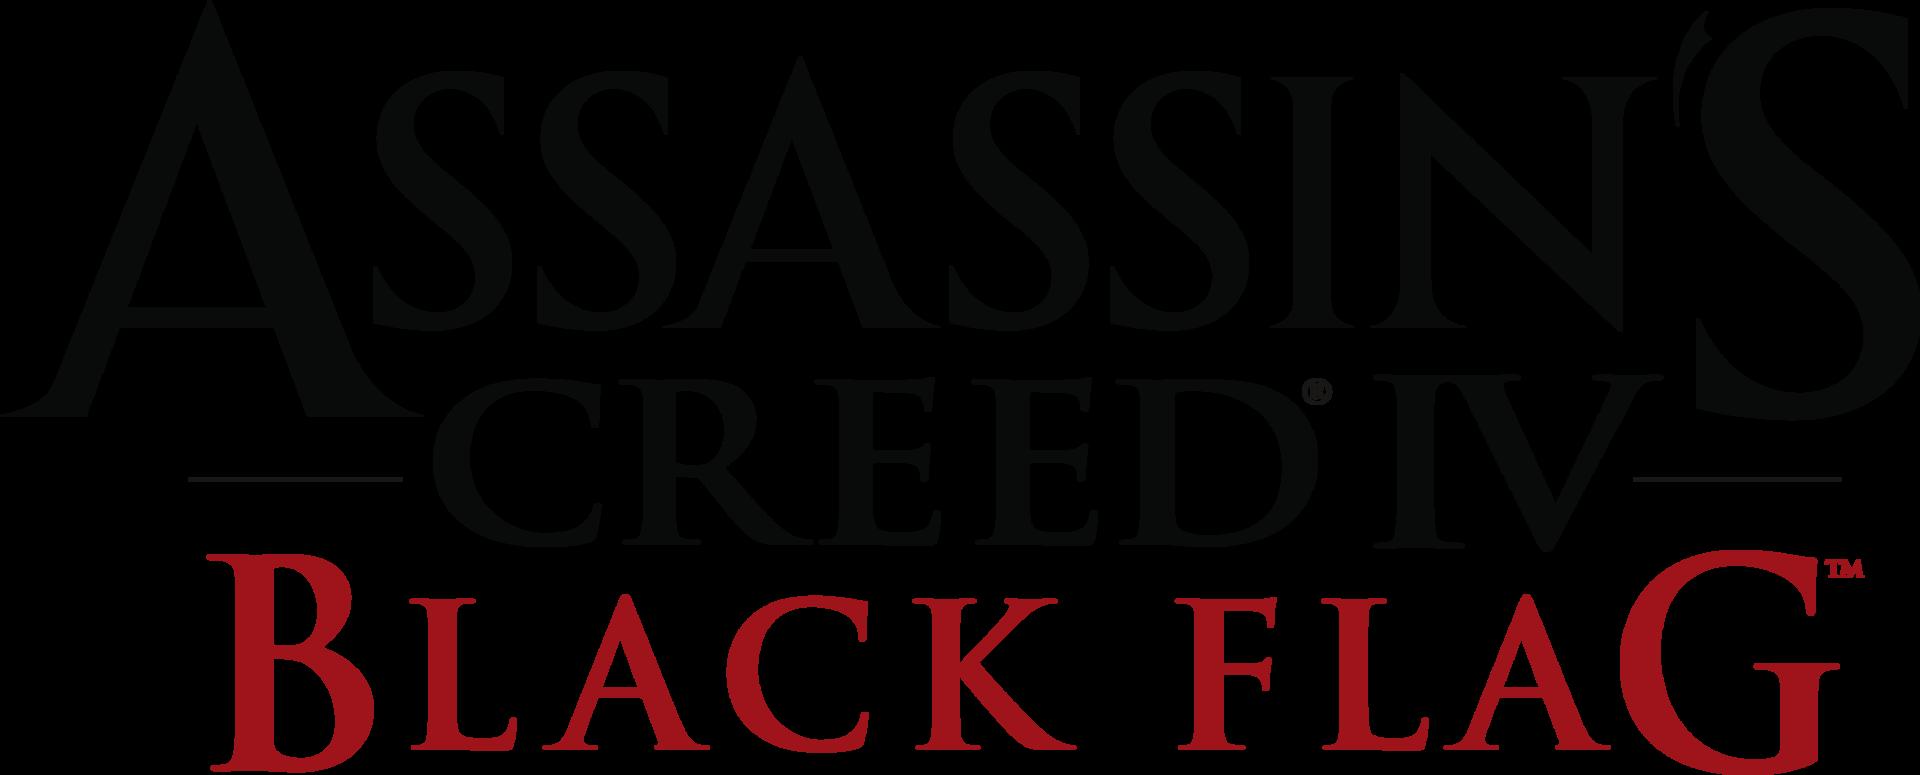 Assassin s Creed IV Black Flag Game Guide & Walkthrough